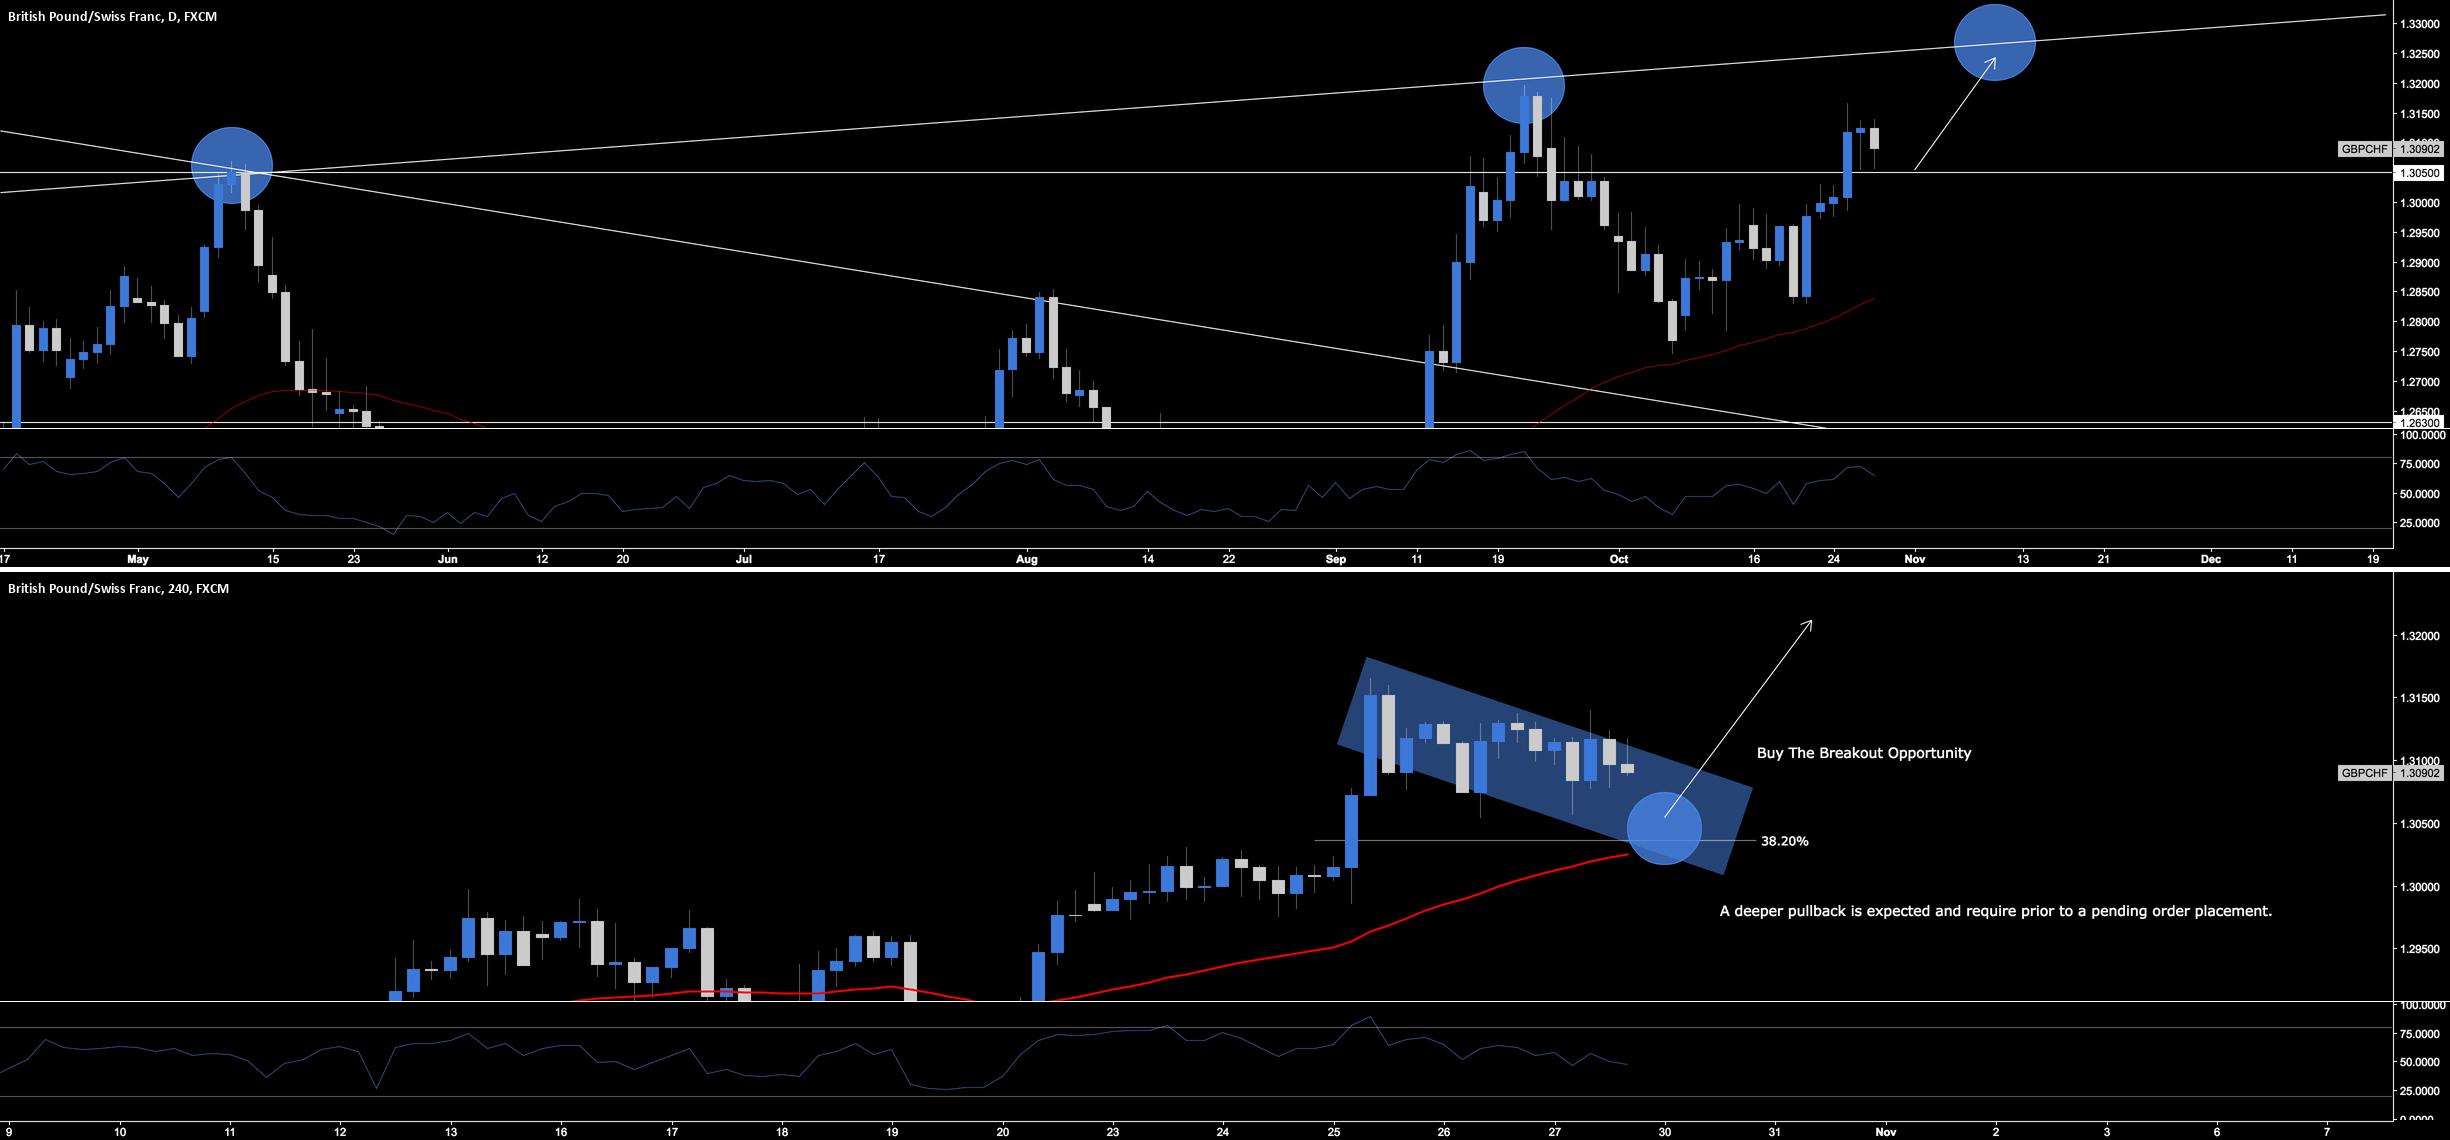 GBP.CHF - Break & Retest Long Opportunity